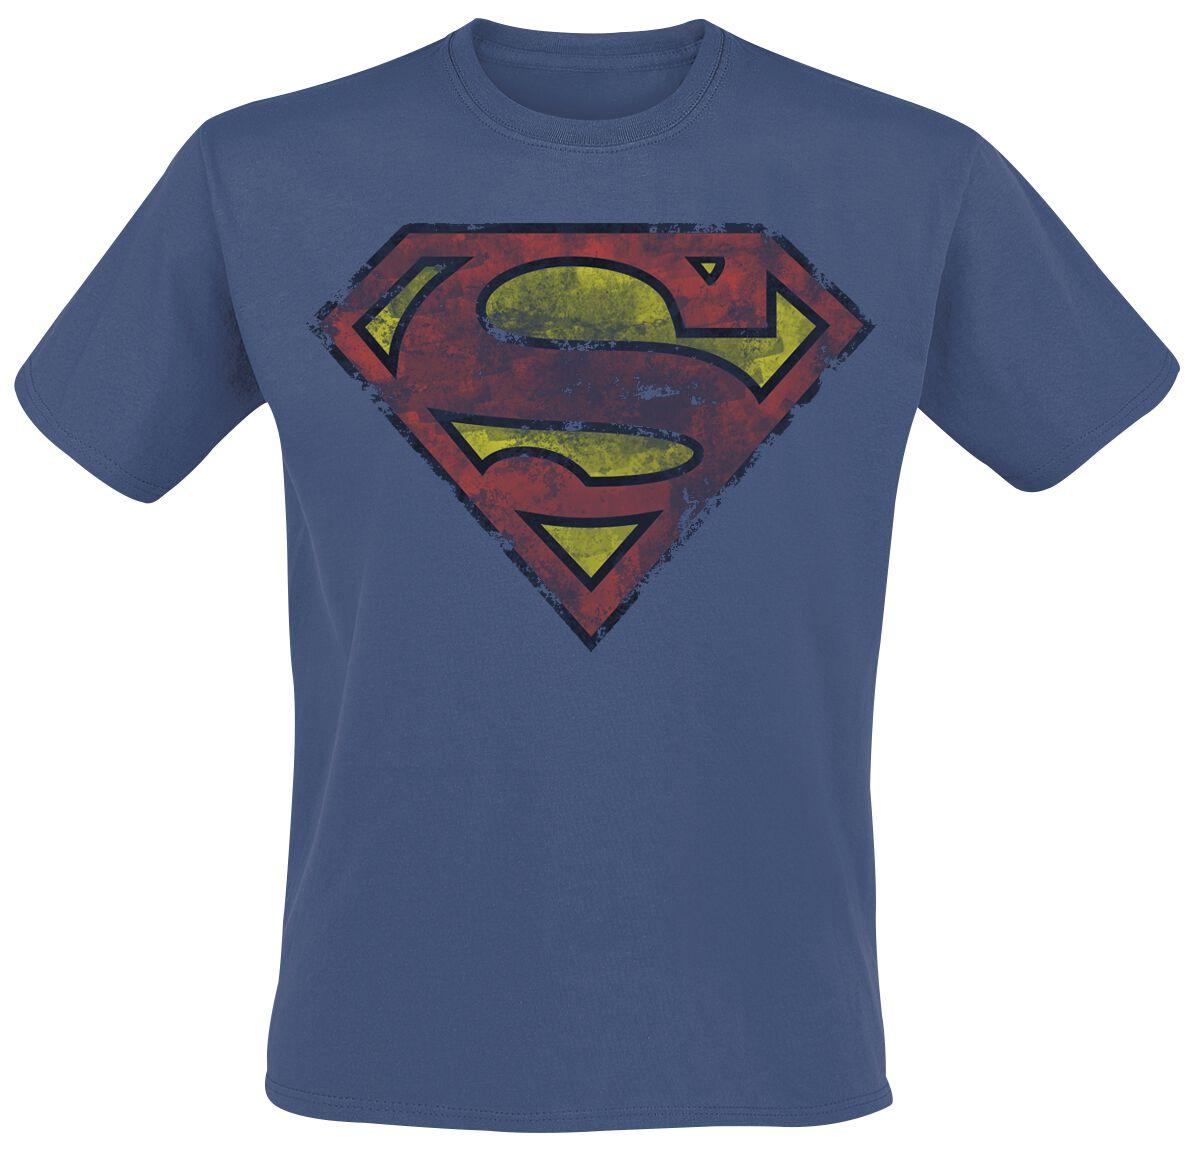 Merch dla Fanów - Koszulki - T-Shirt Superman Heavy Distressing Logo T-Shirt niebieski - 358174